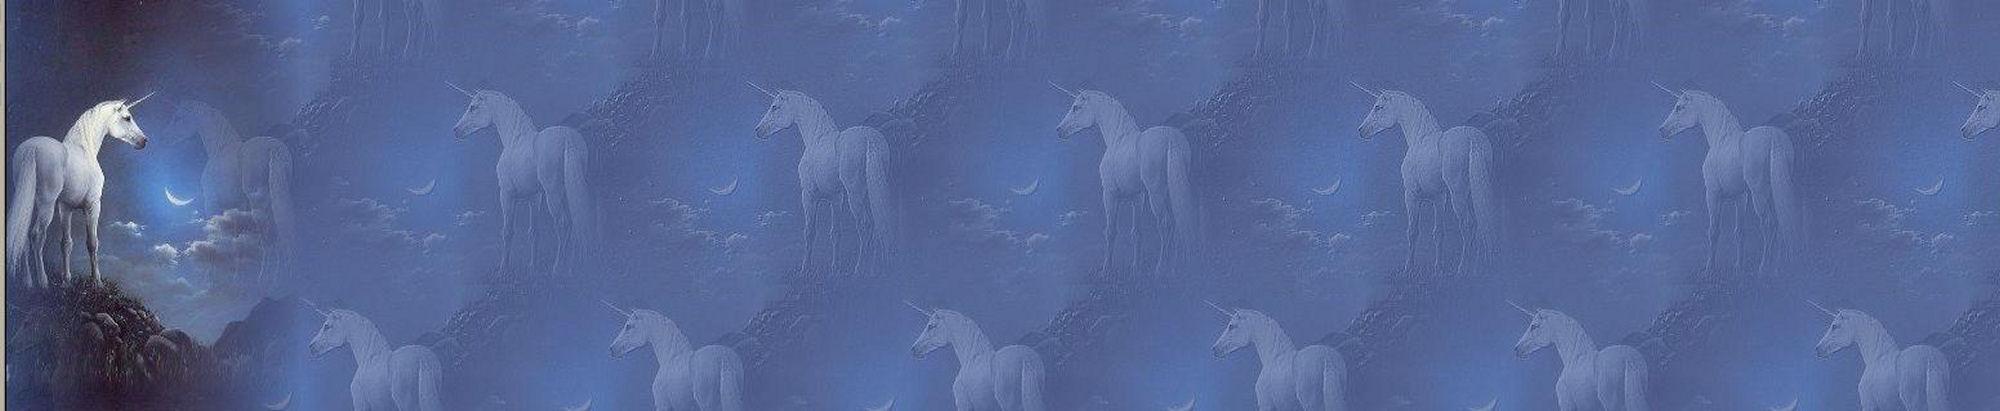 Fondo IM mitos_unicornio_03.imf